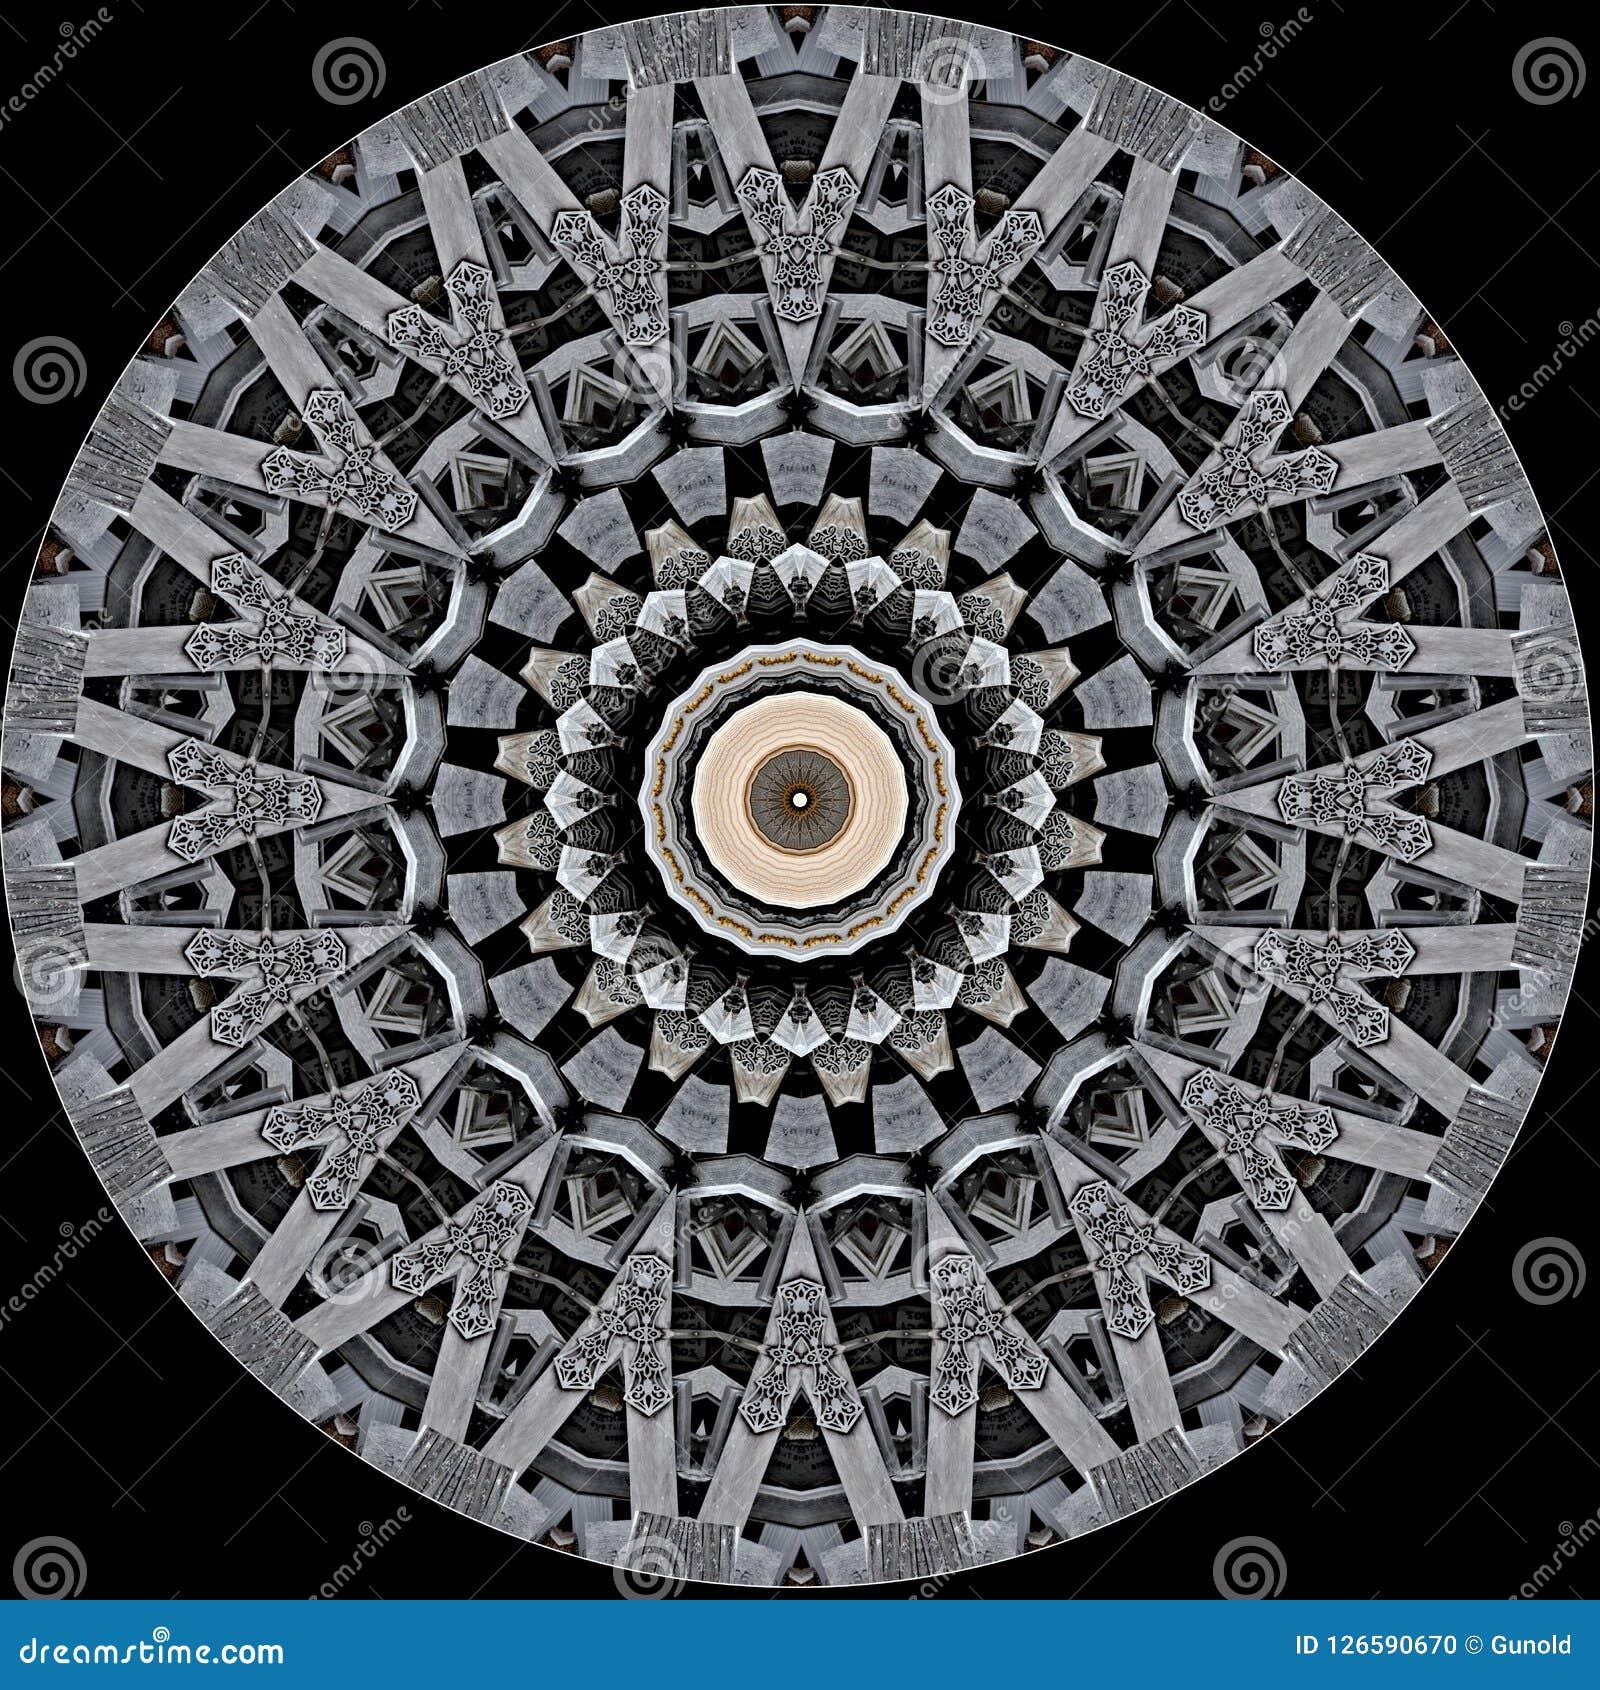 Mysteriously digital art design of filigree ornamental carved wood